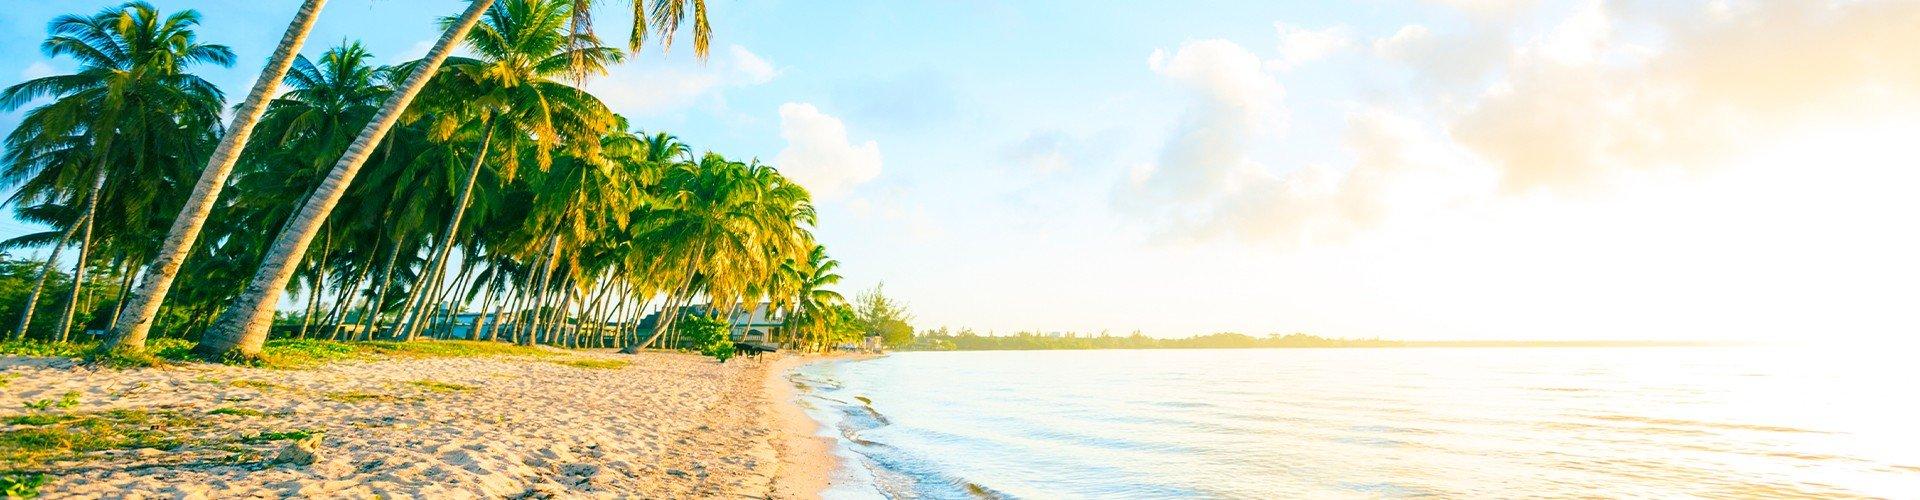 Familienurlaub auf Kuba